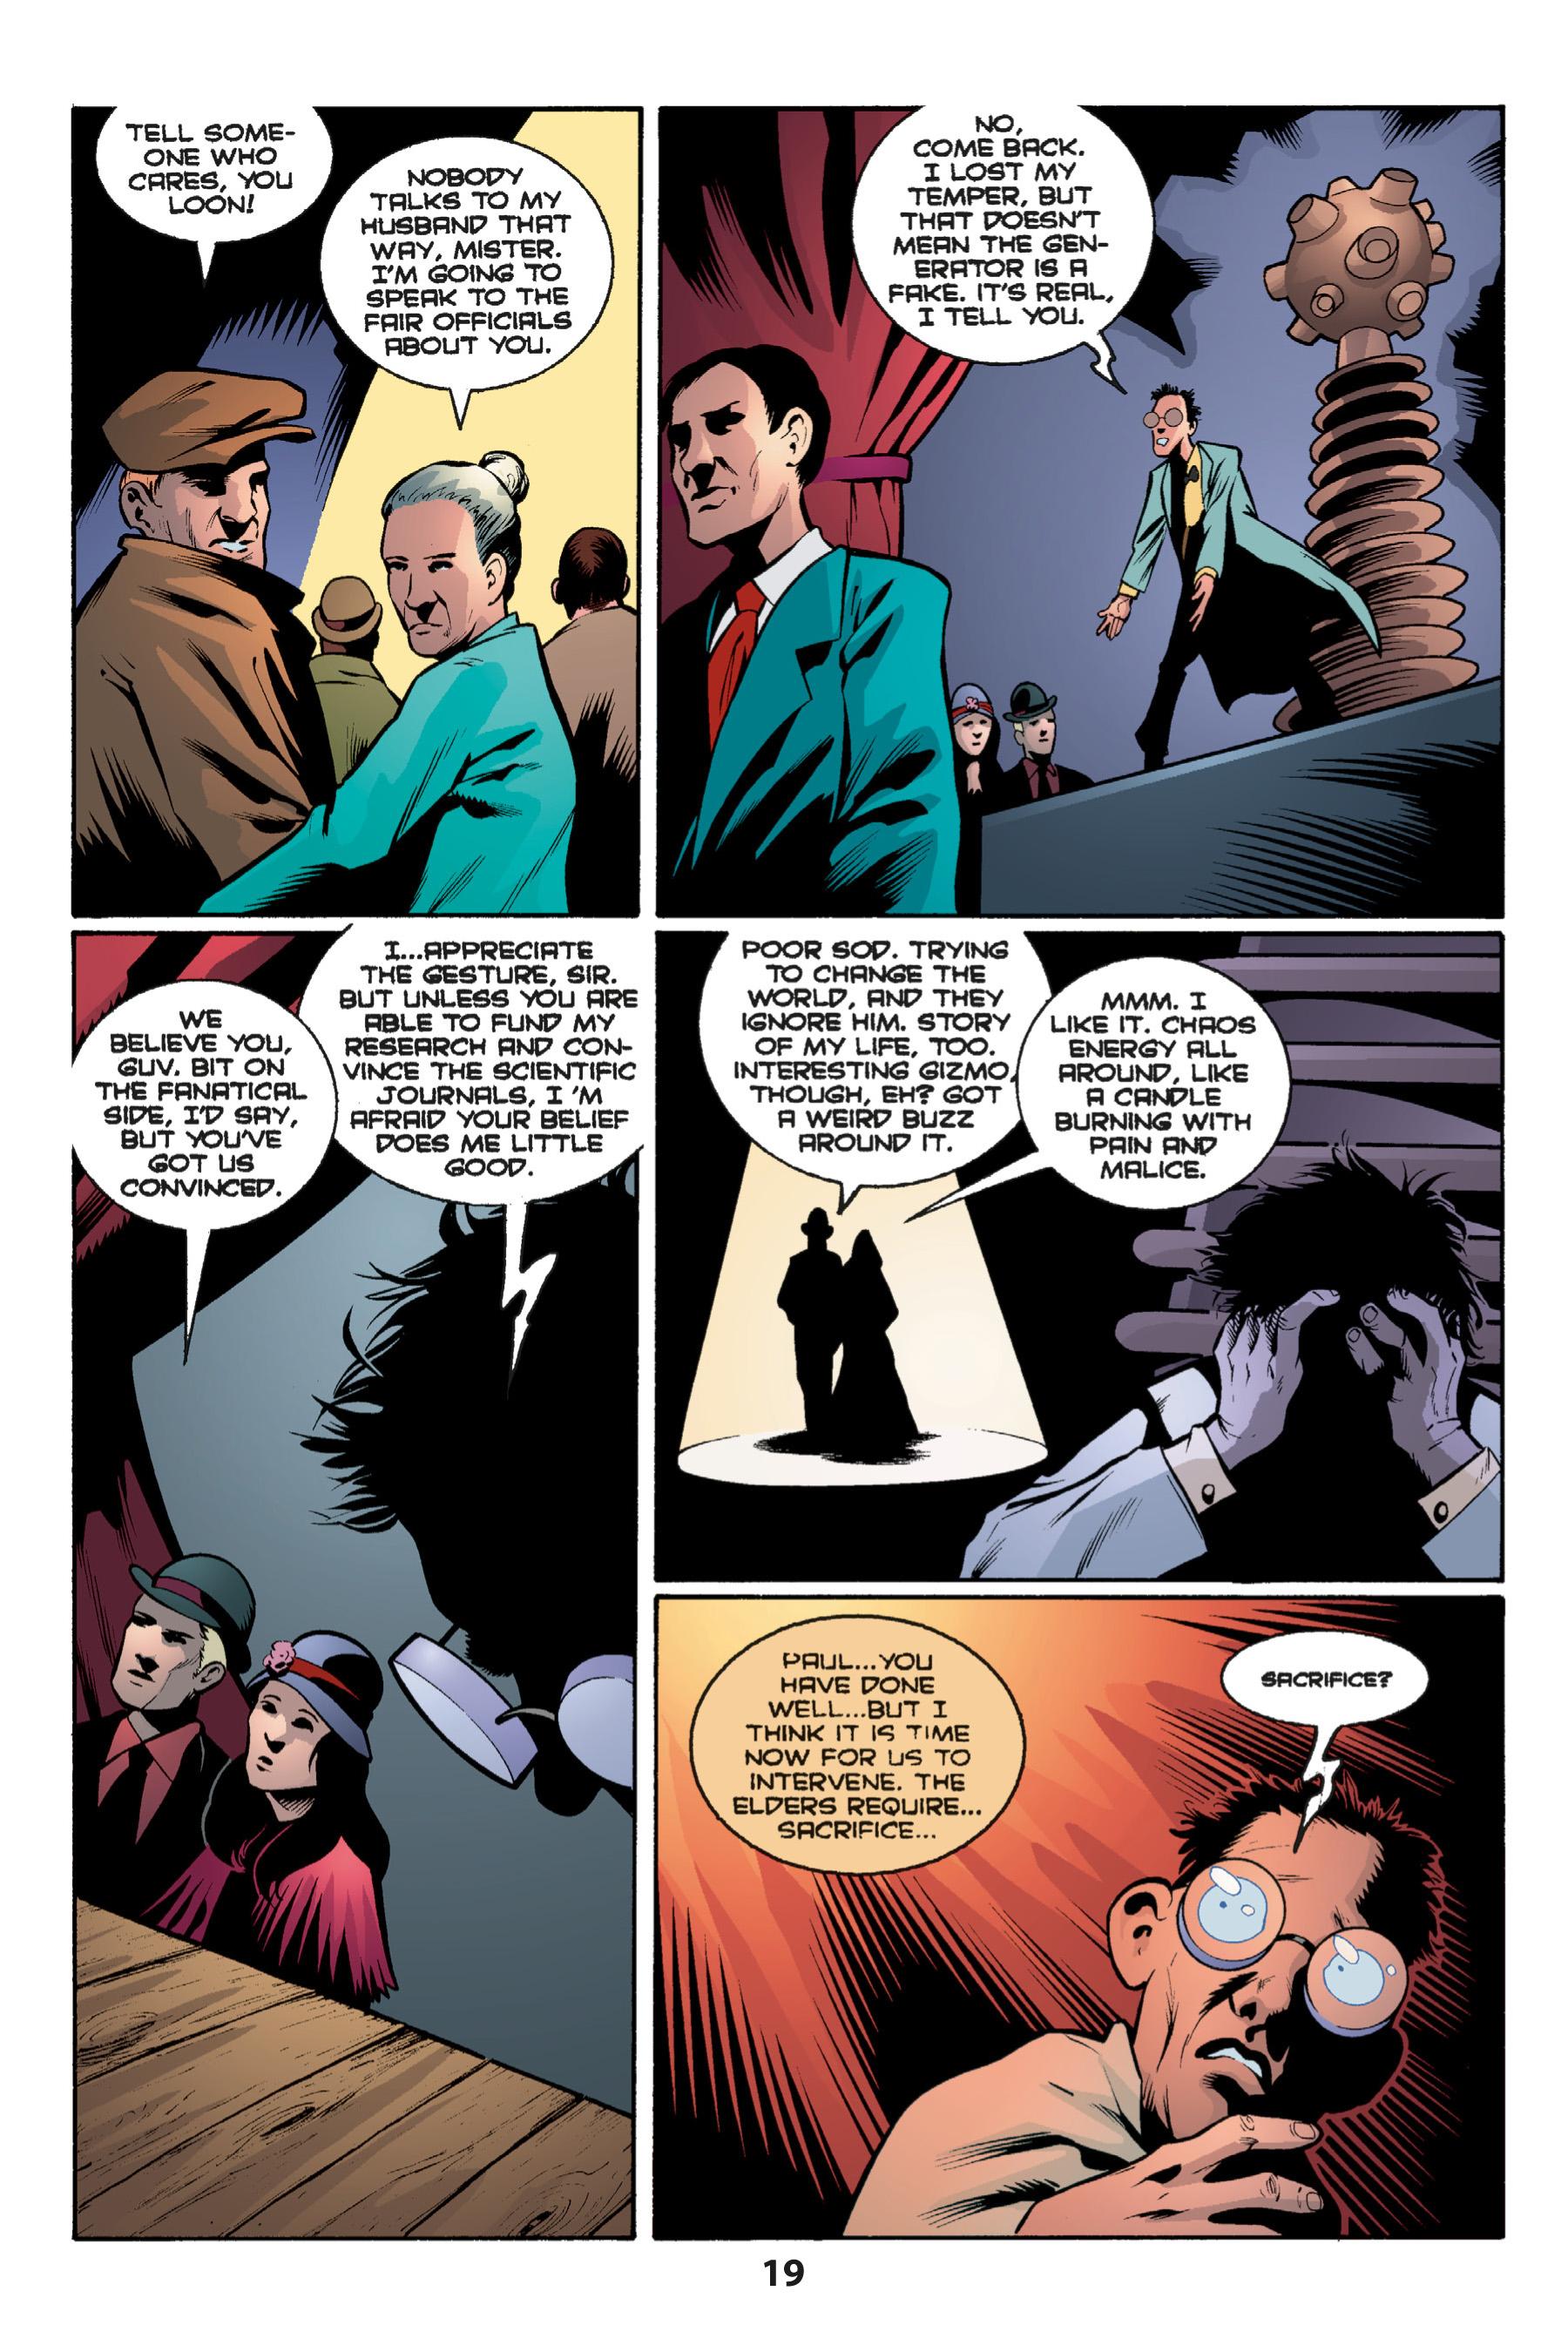 Read online Buffy the Vampire Slayer: Omnibus comic -  Issue # TPB 1 - 21